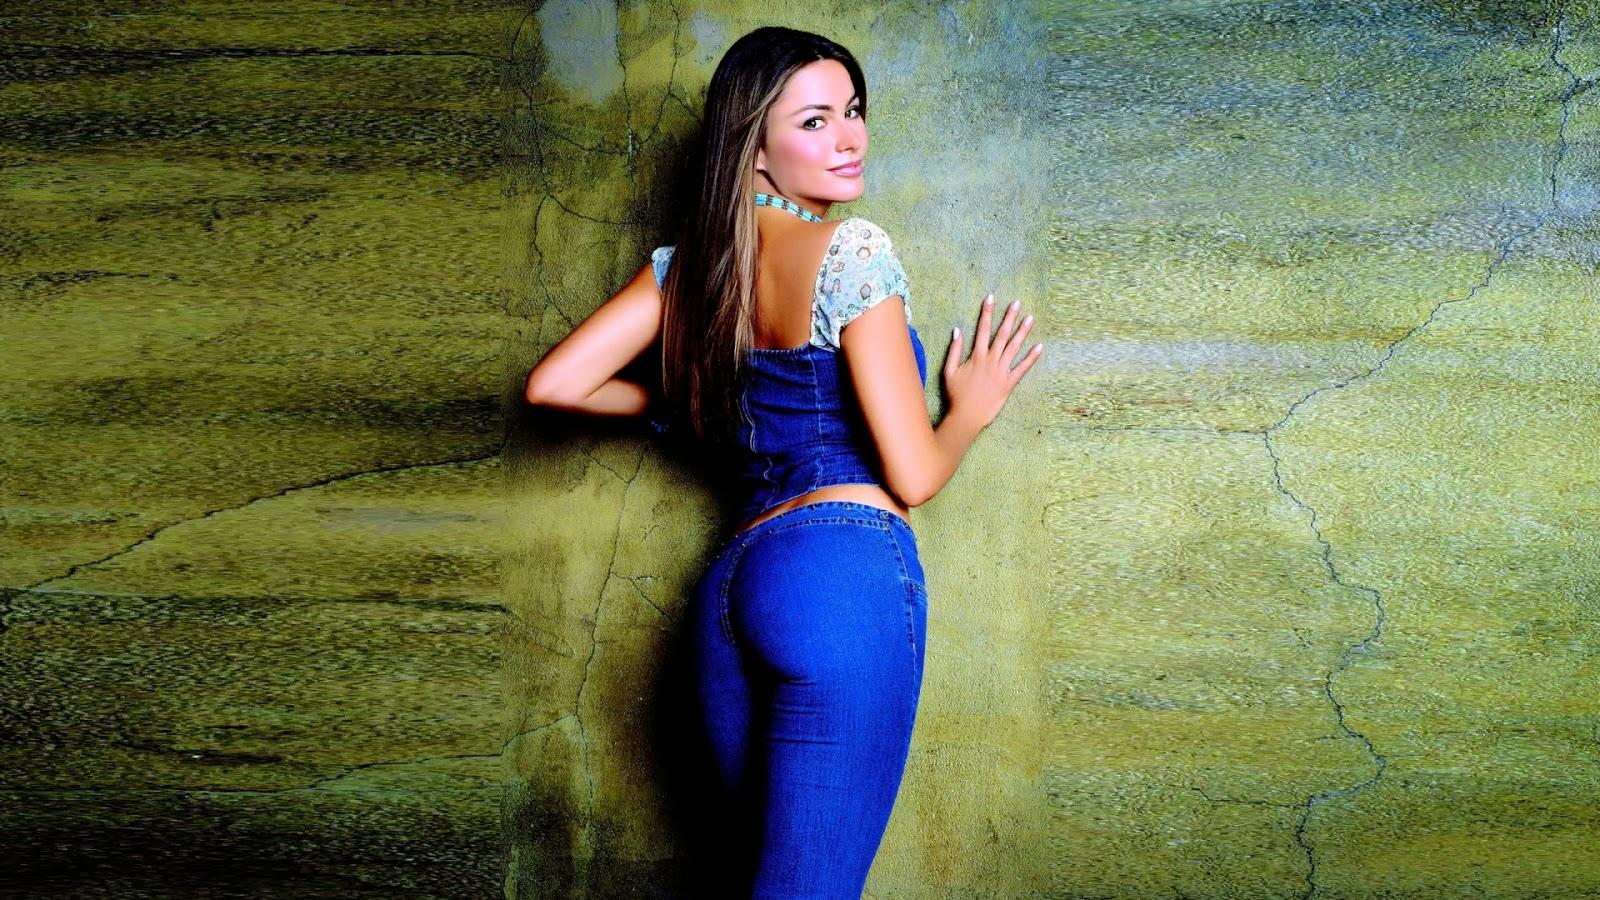 Sofia Vergara Hd Wallpapers Download 1600x900